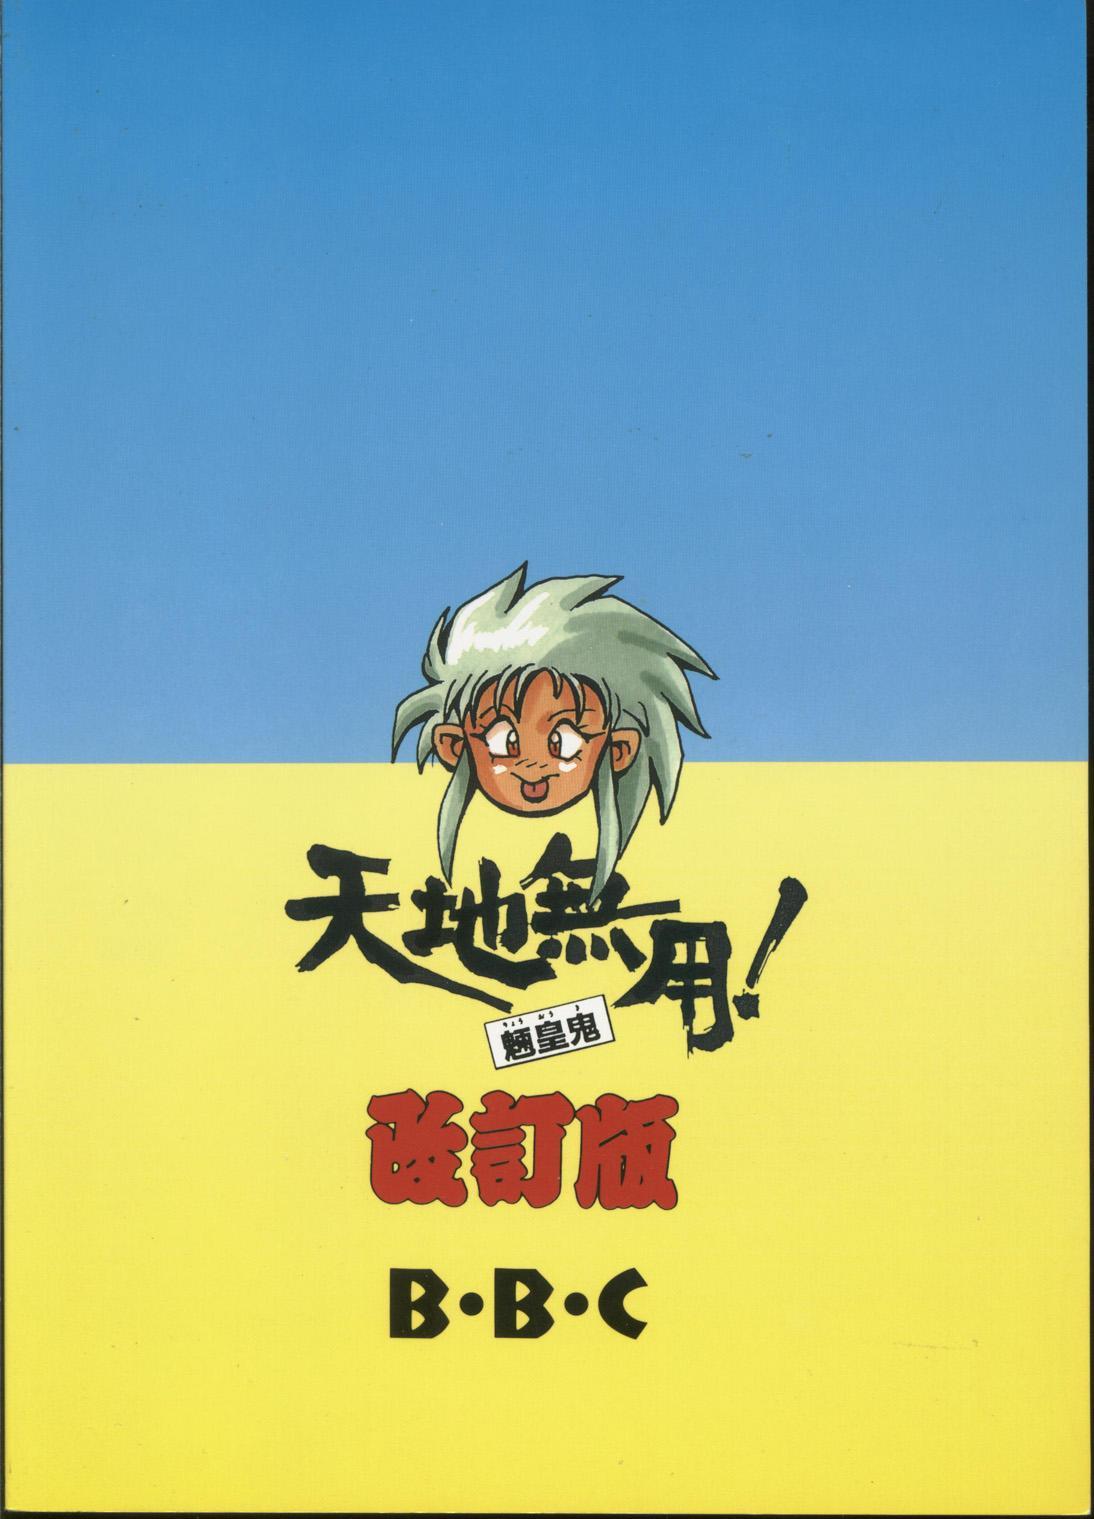 [B.B.C] Tenchi Muyou! Ryou-ou-ki Kaiteiben (Tenchi Muyou!) 81